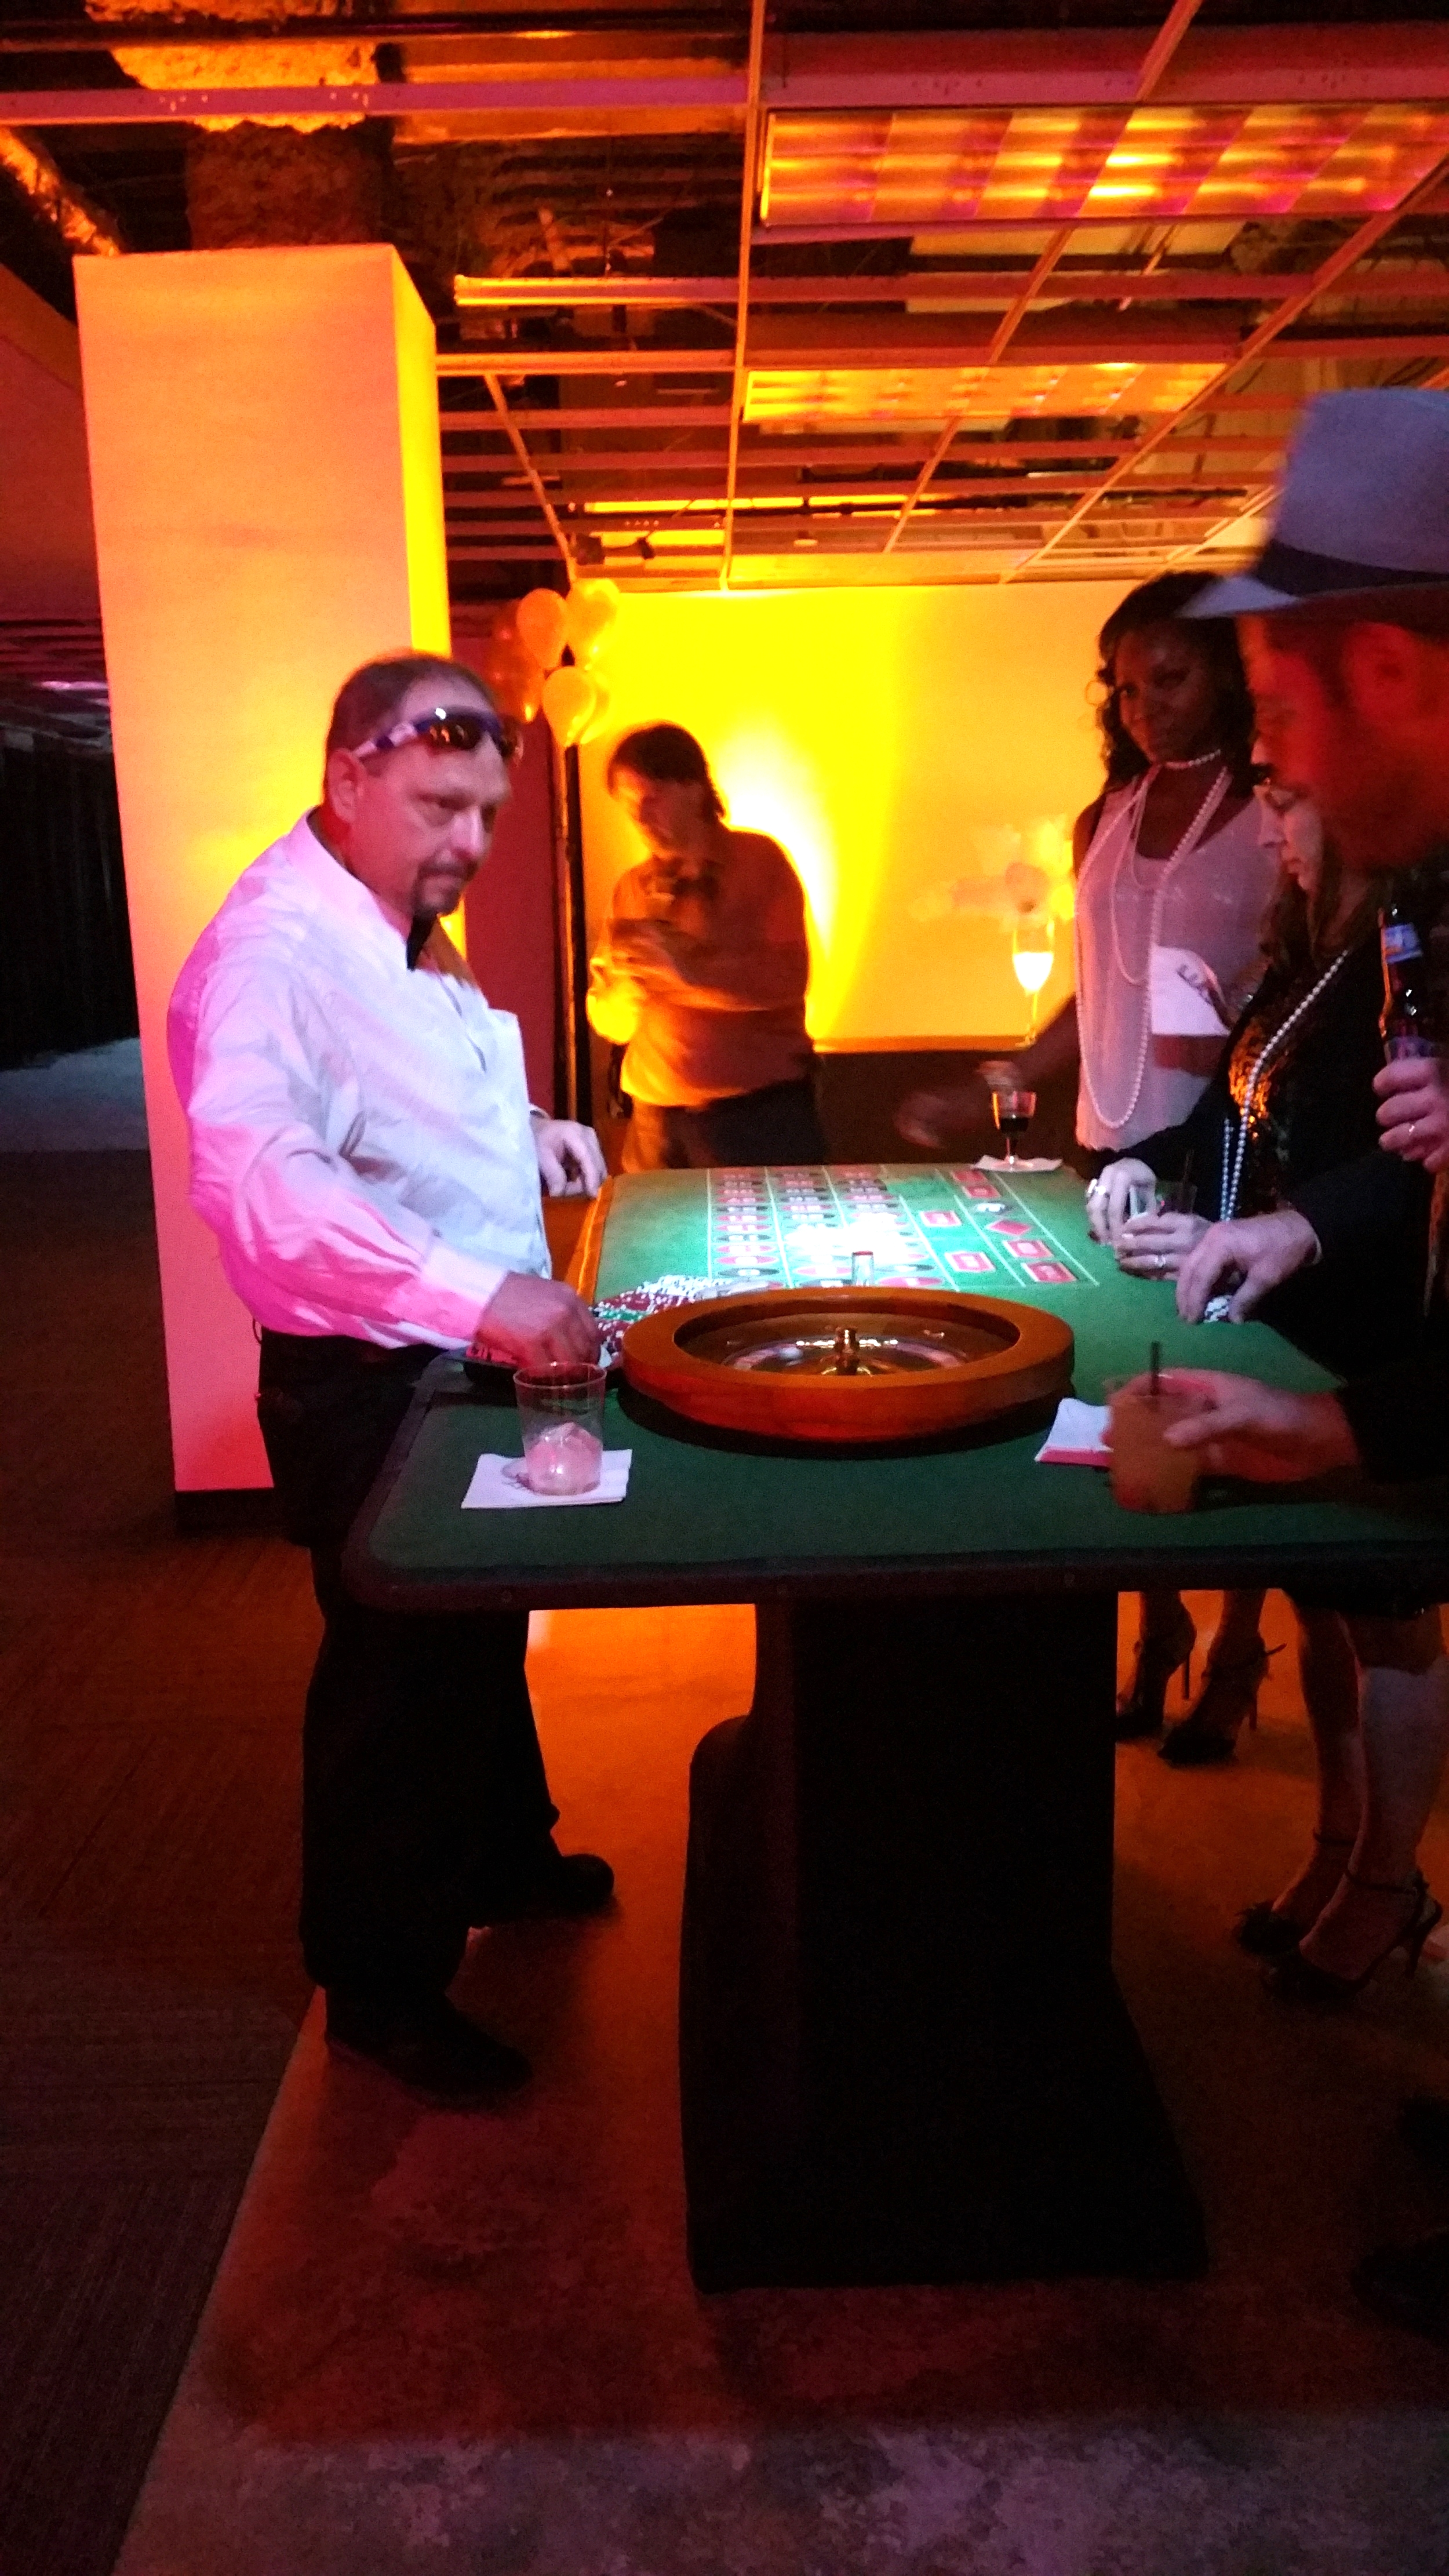 Fundraising Casino Night